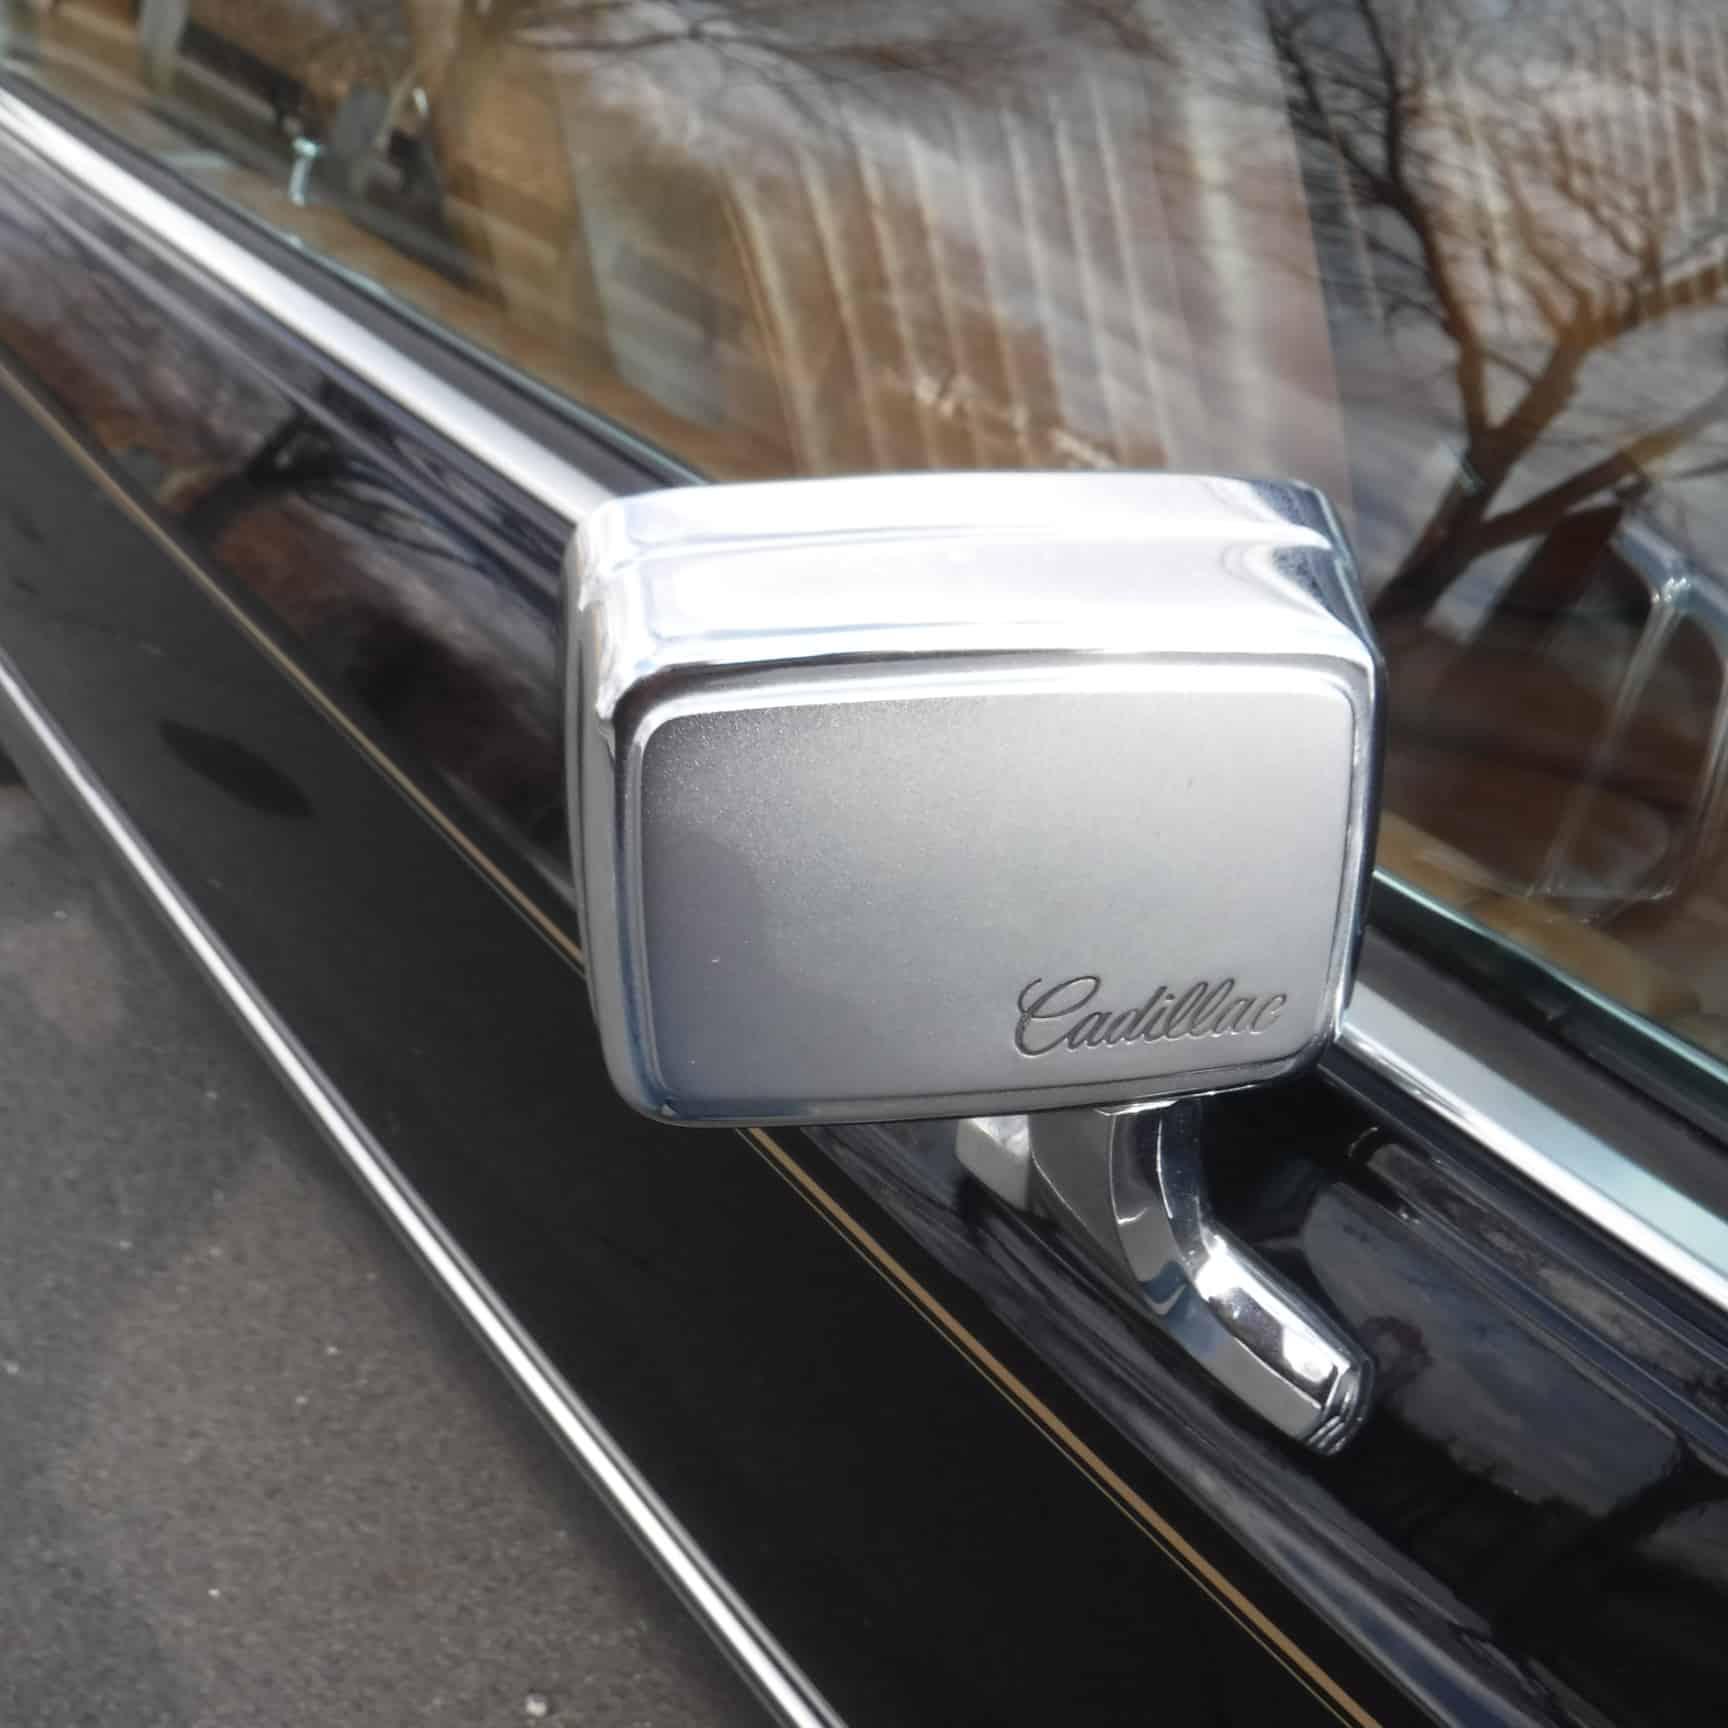 1980 Cadillac 044